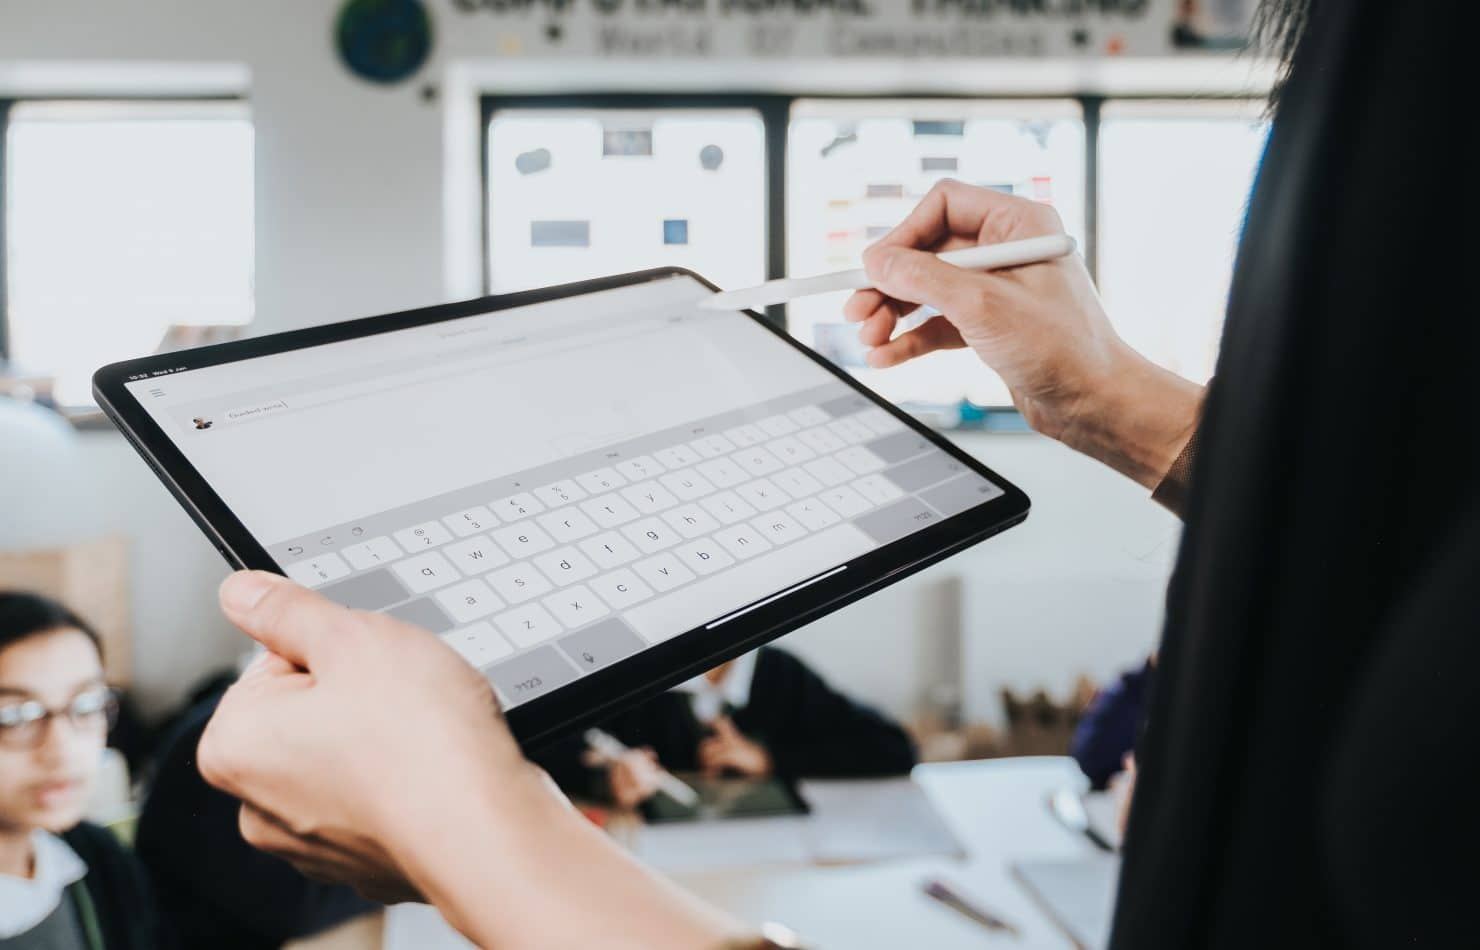 Teacher reducing workload through iPad